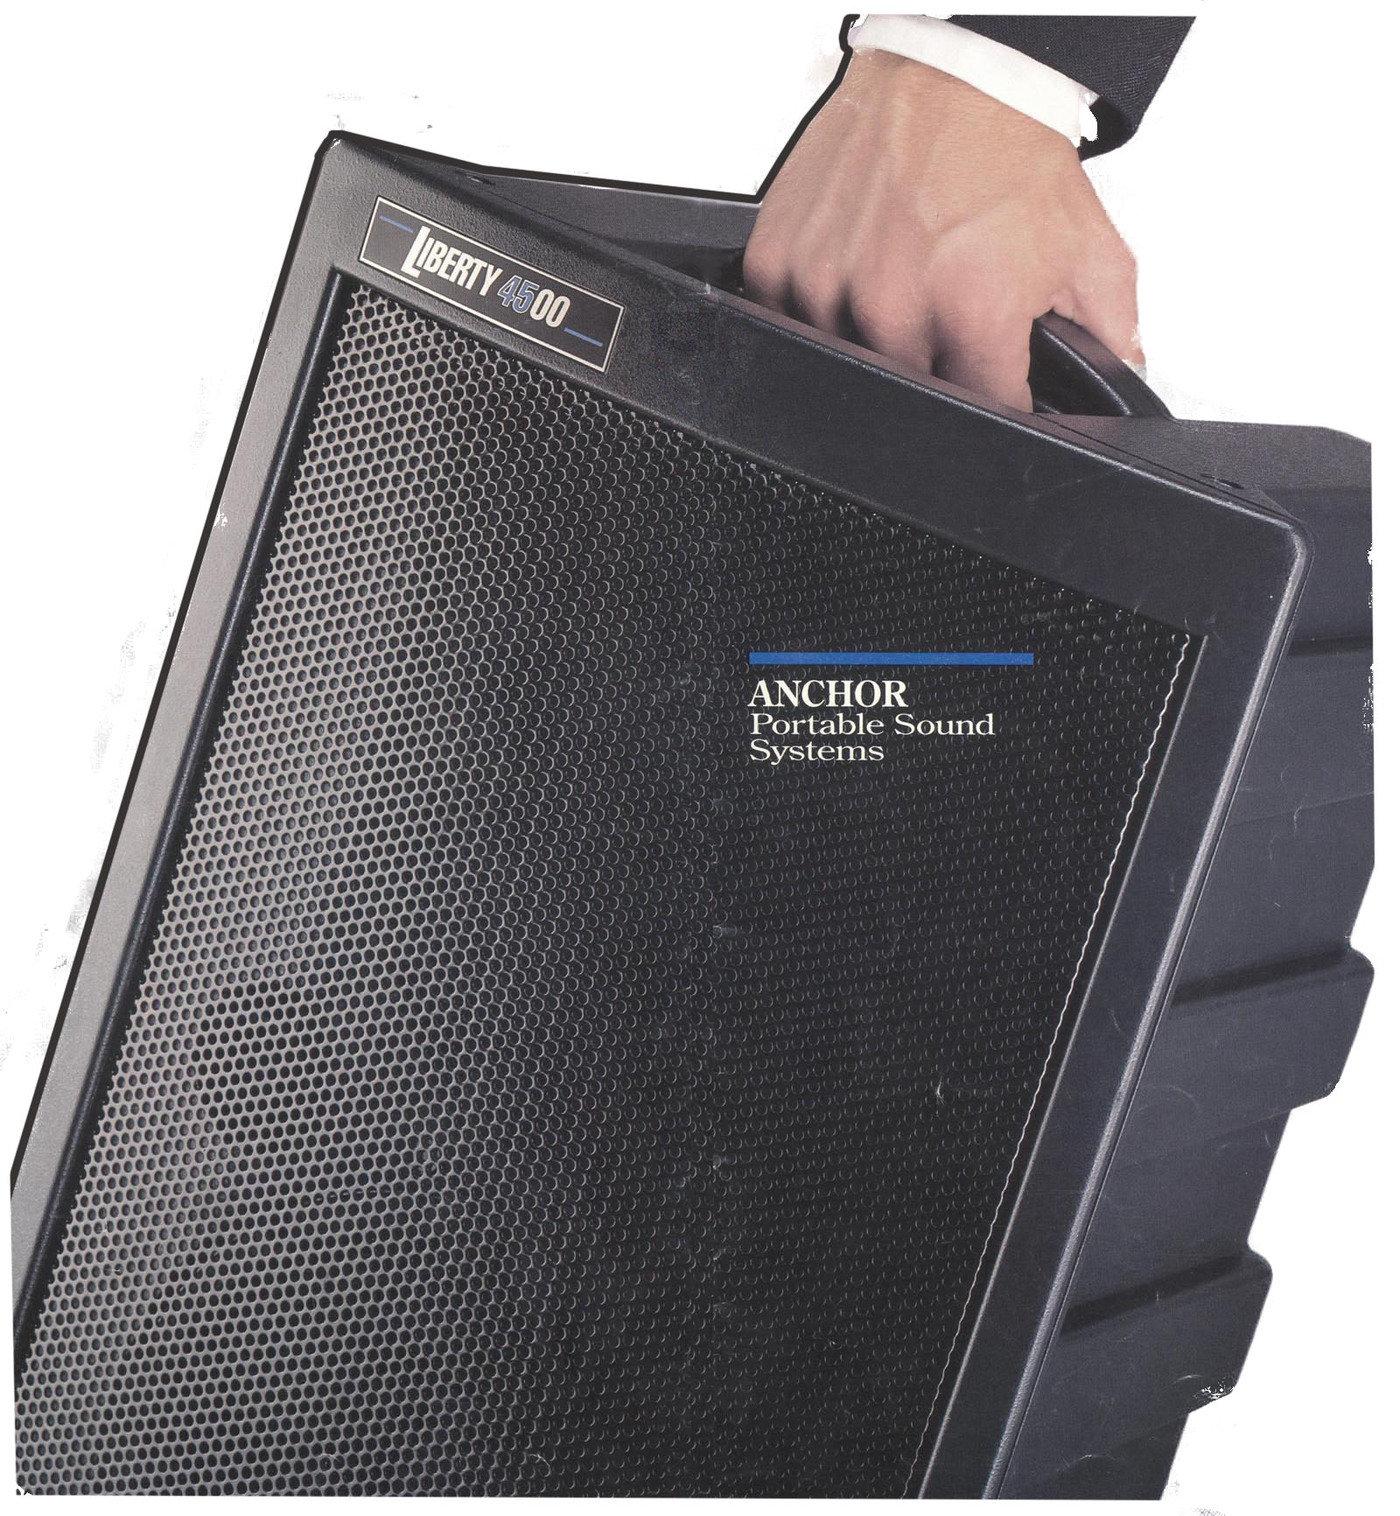 anchor audio loudspeaker system by kraig kooiman at coroflot com